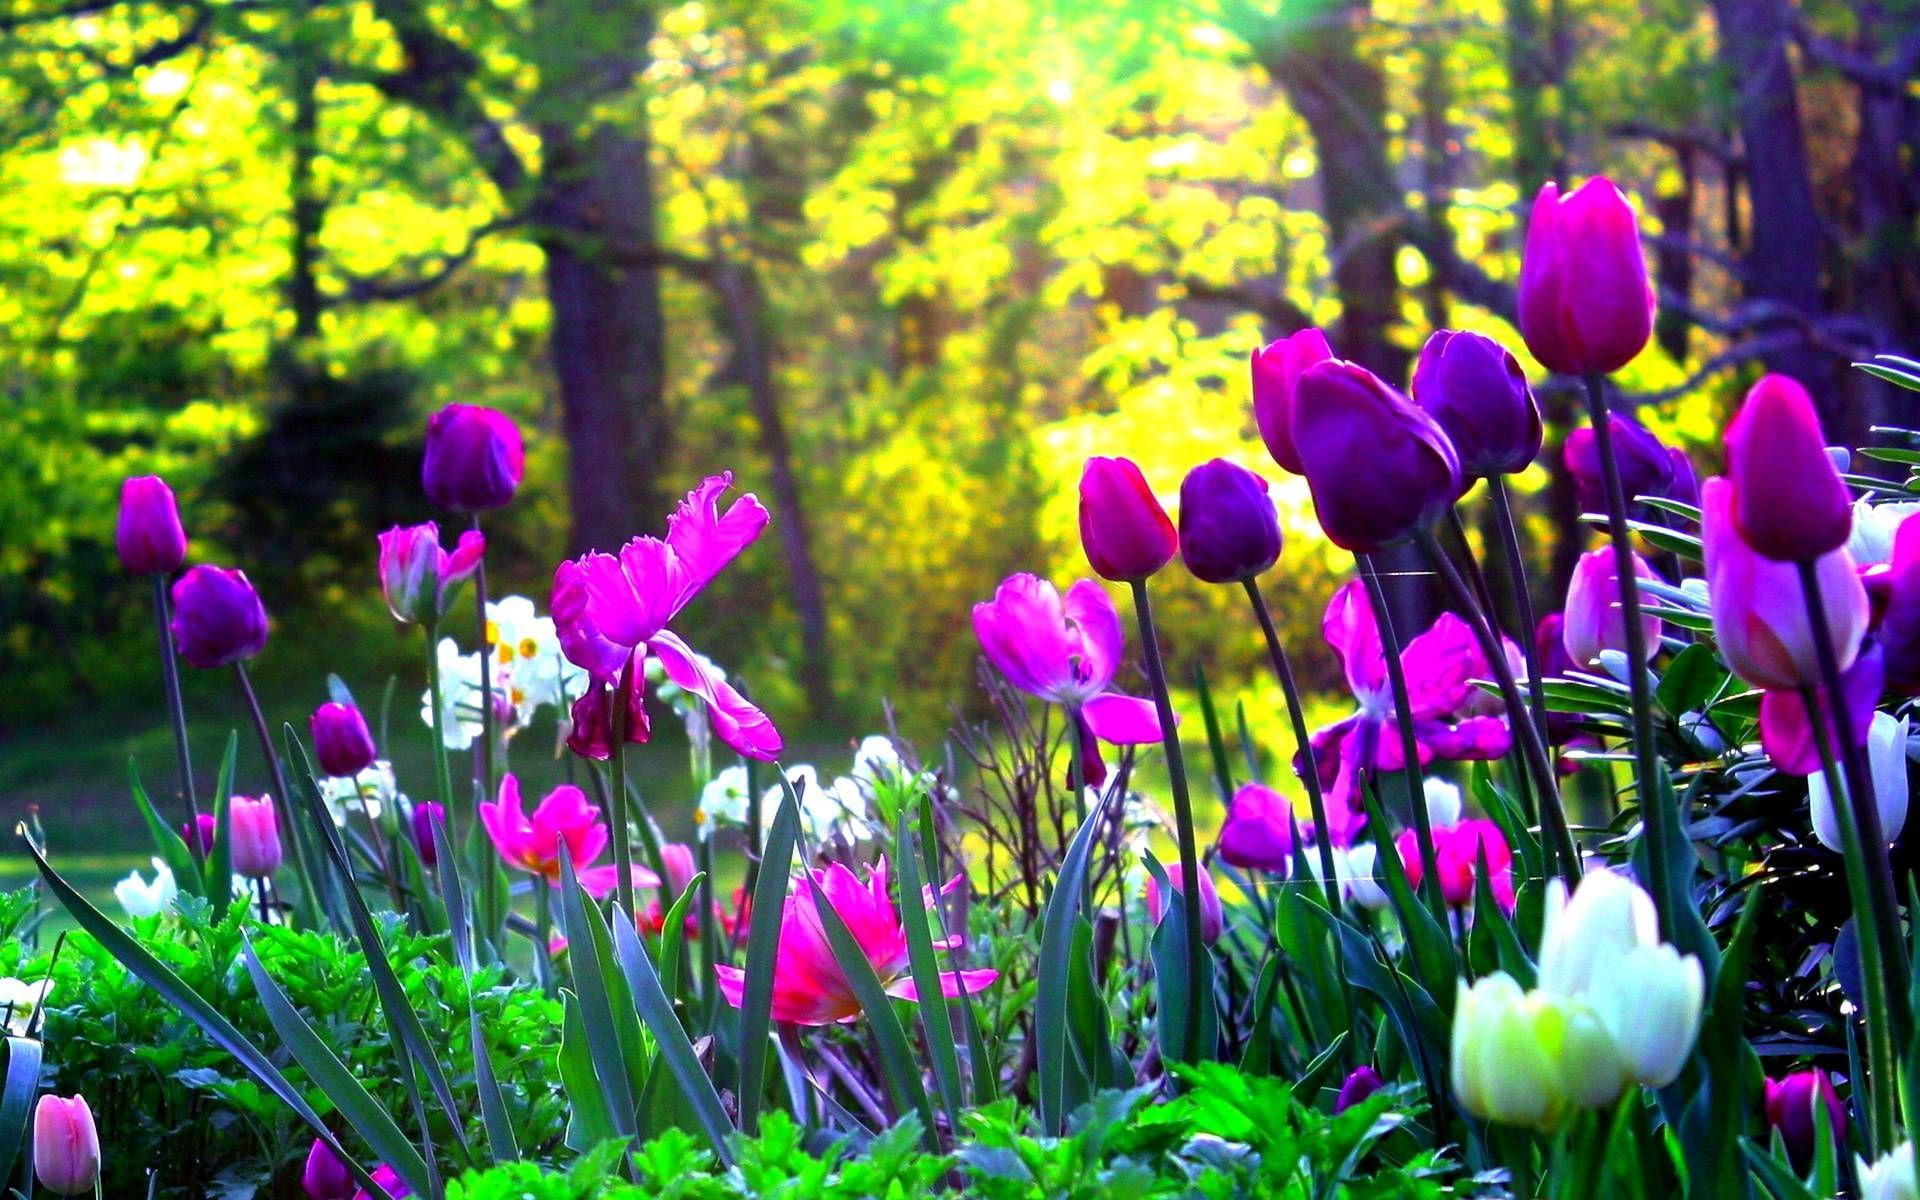 Purple Yellow Red Tulips Wooden Background Spring Pictures Wallpaper Desktop Laptop Comp Spring Wallpaper Spring Flowers Background Beautiful Scenery Wallpaper